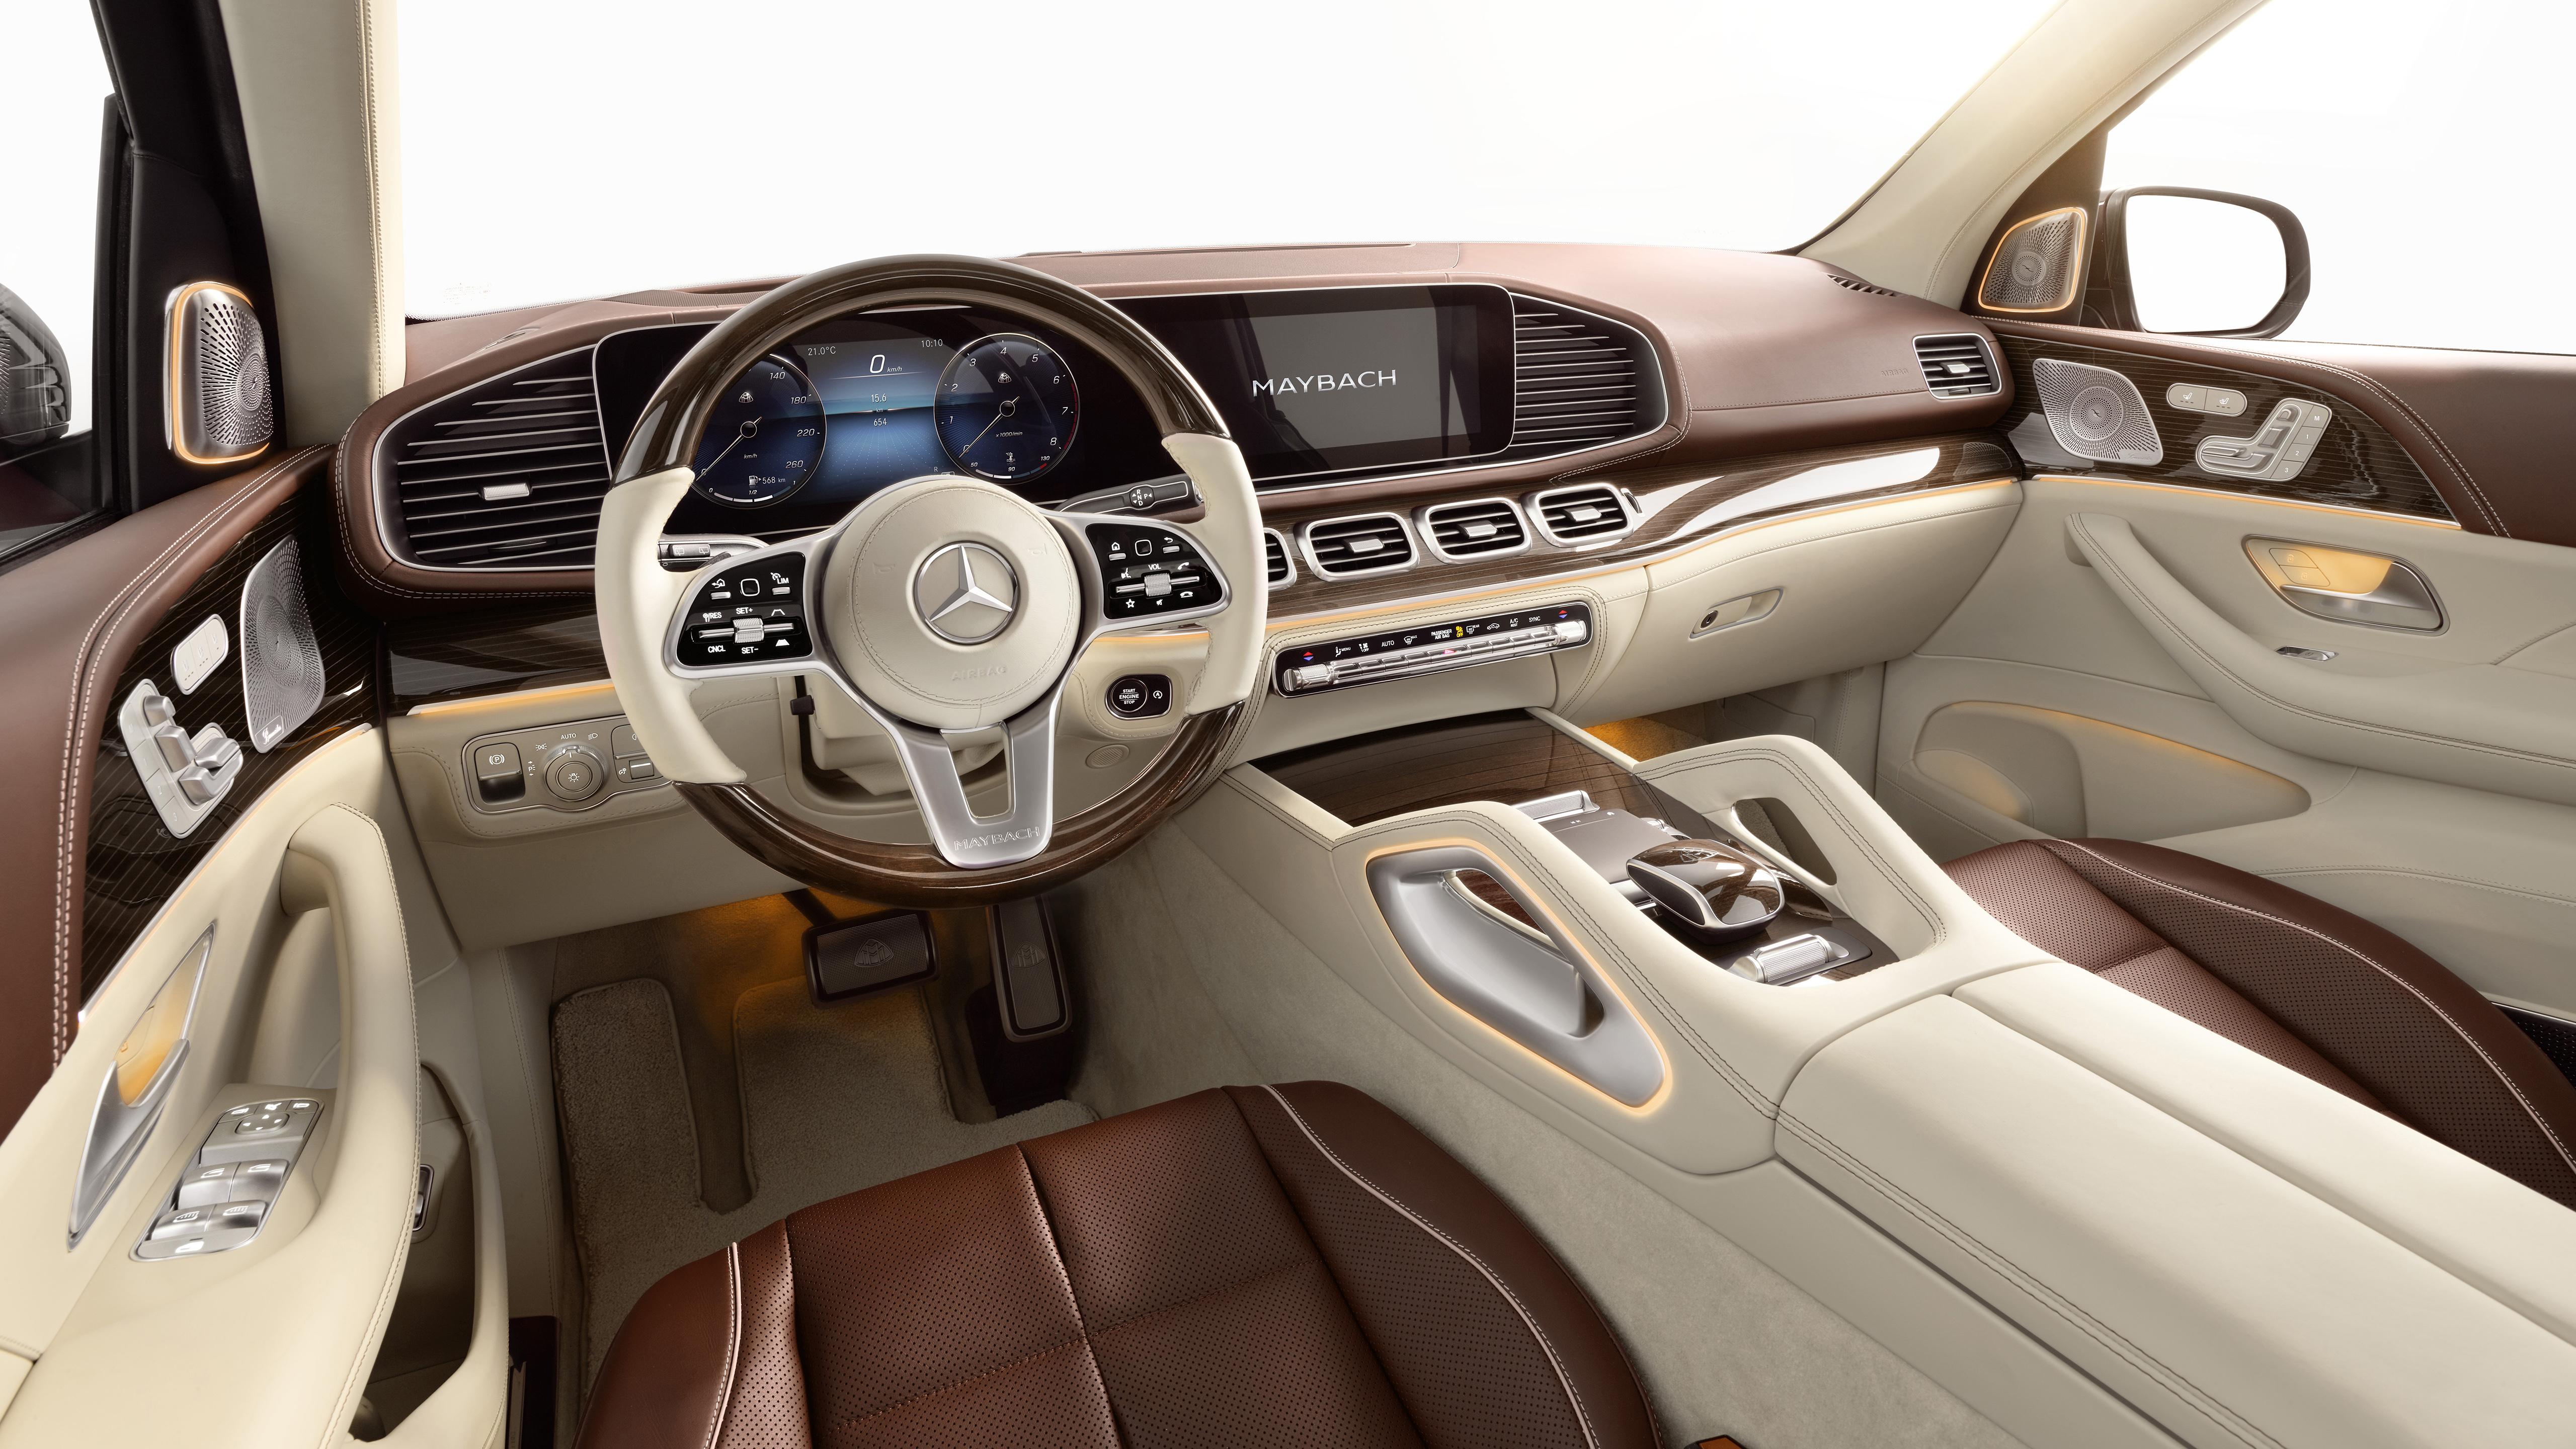 Mercedes-Maybach GLS 600 4MATIC 2020 4K Interior Wallpaper ...